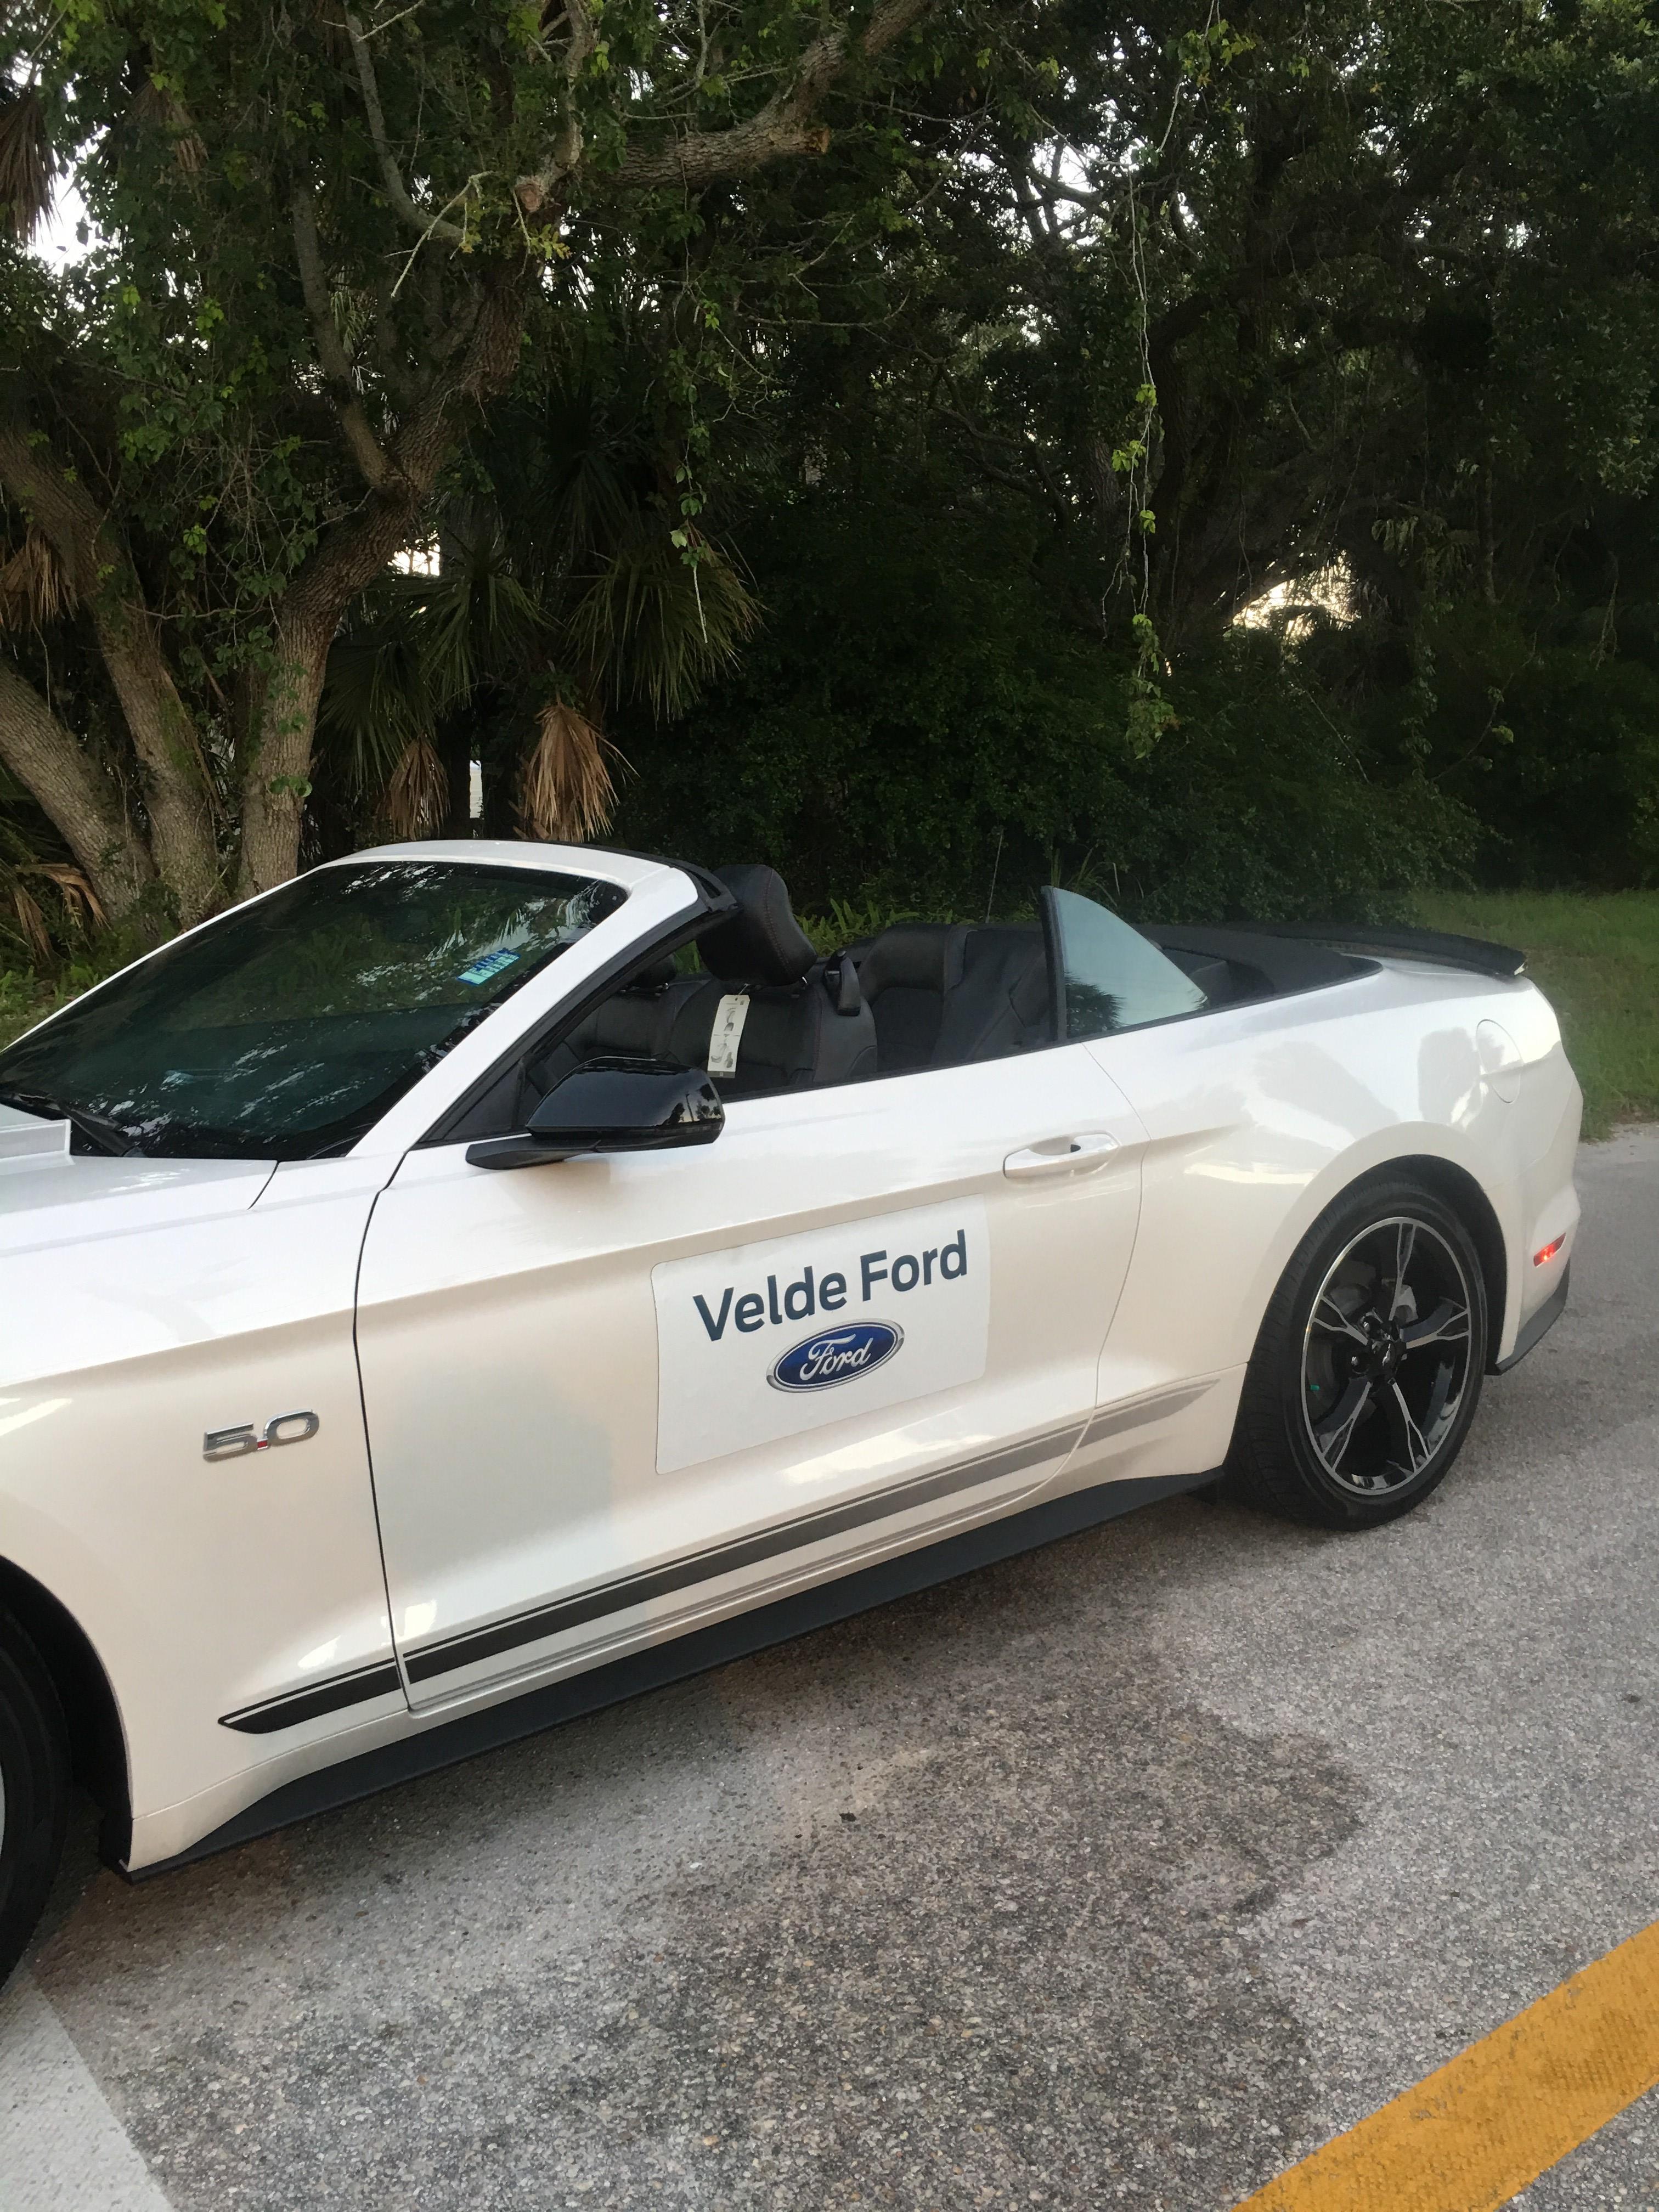 May 16th ... & Velde Ford Inc | New Ford dealership in Vero Beach FL 32962 markmcfarlin.com